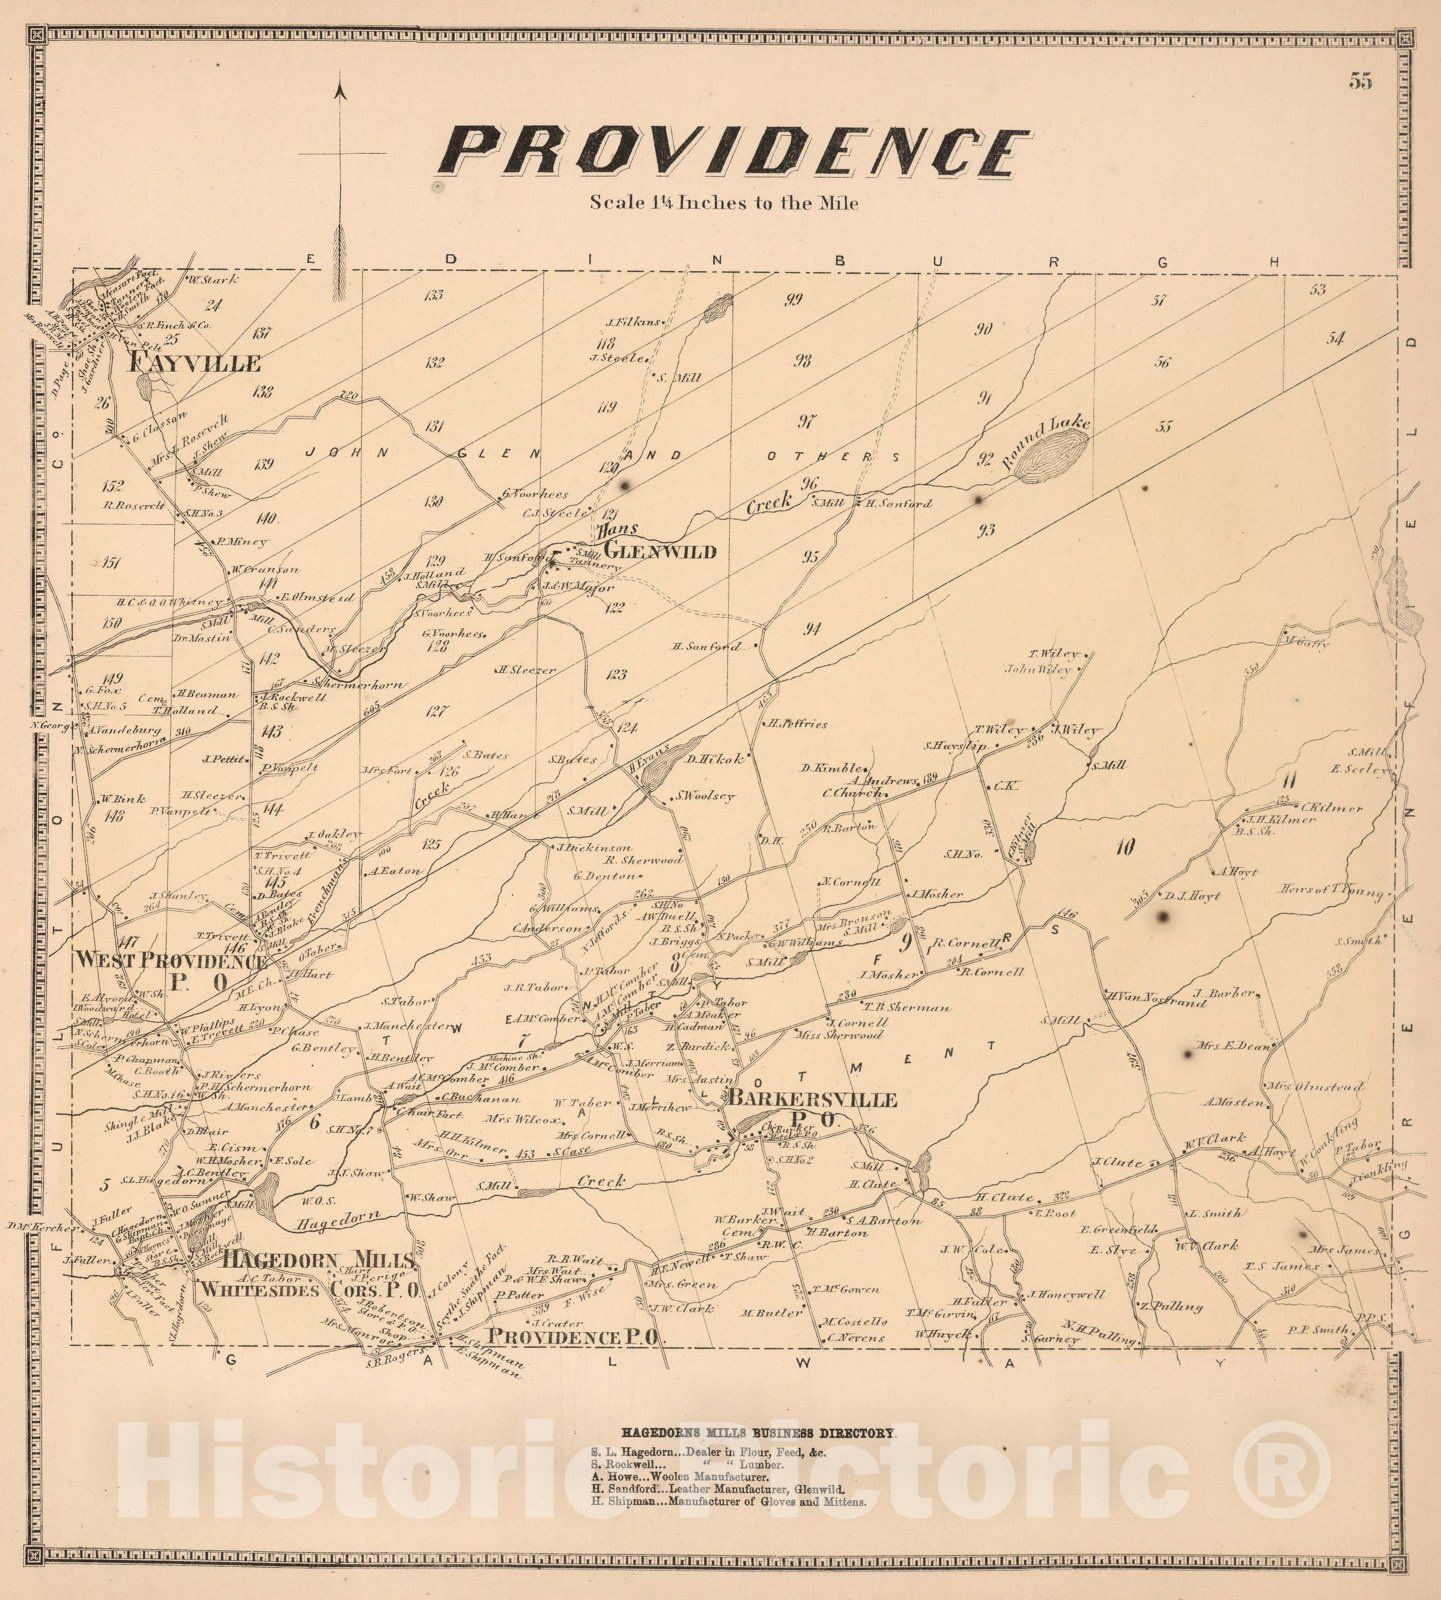 <p>Providence, Saratoga County, New York., 1866</p>